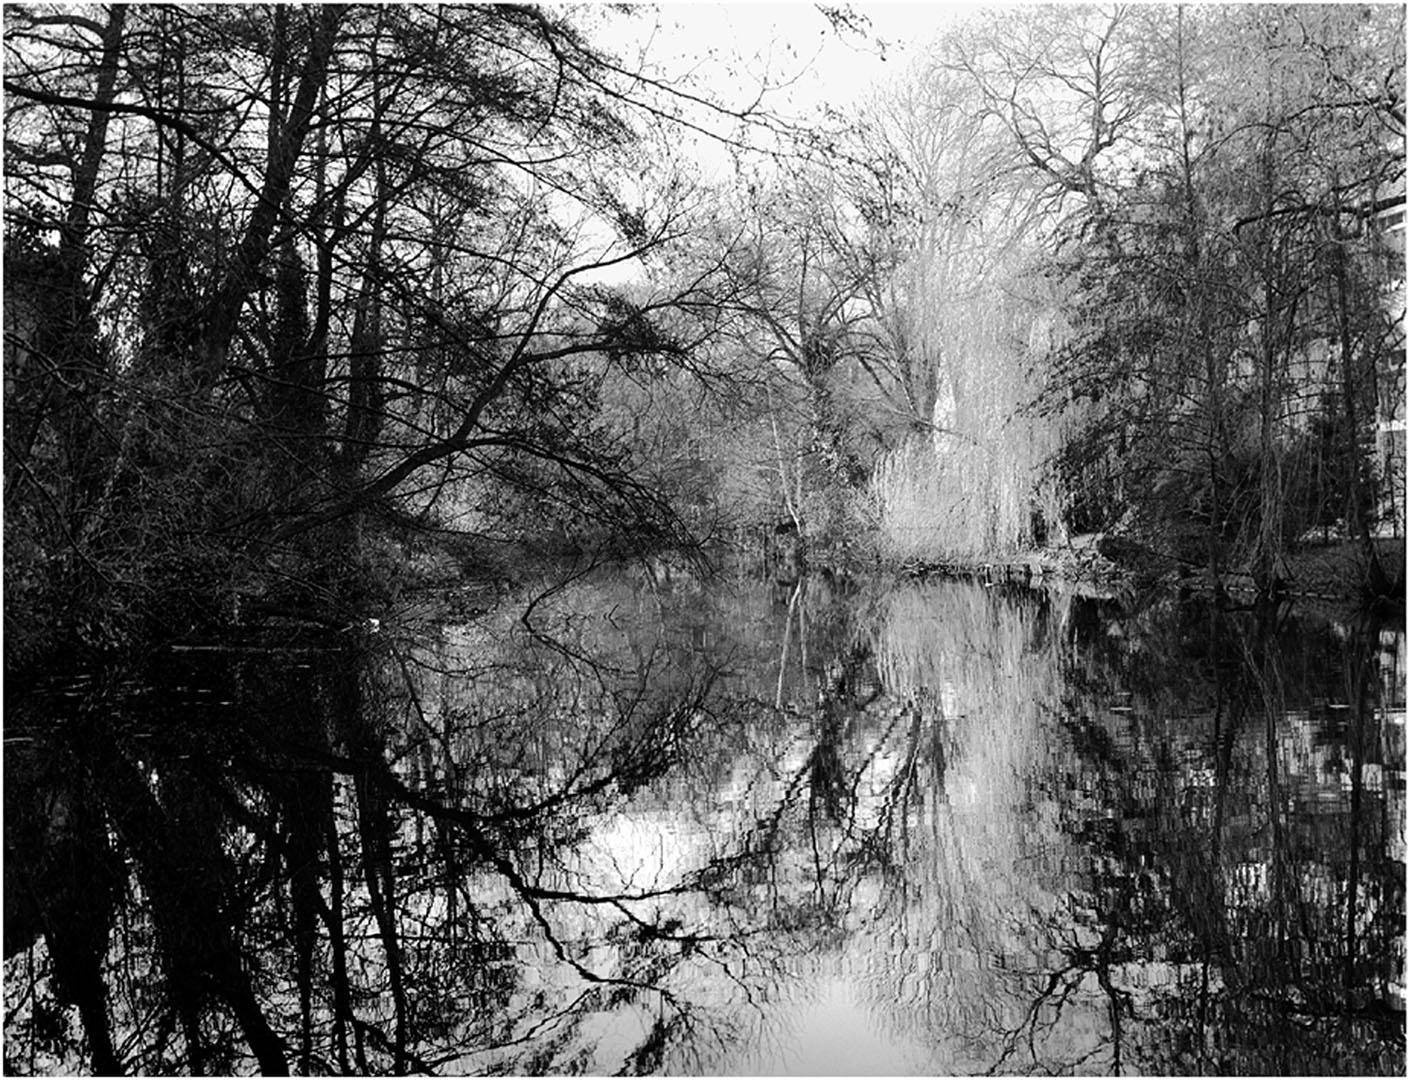 Muensterland_142_L1.59